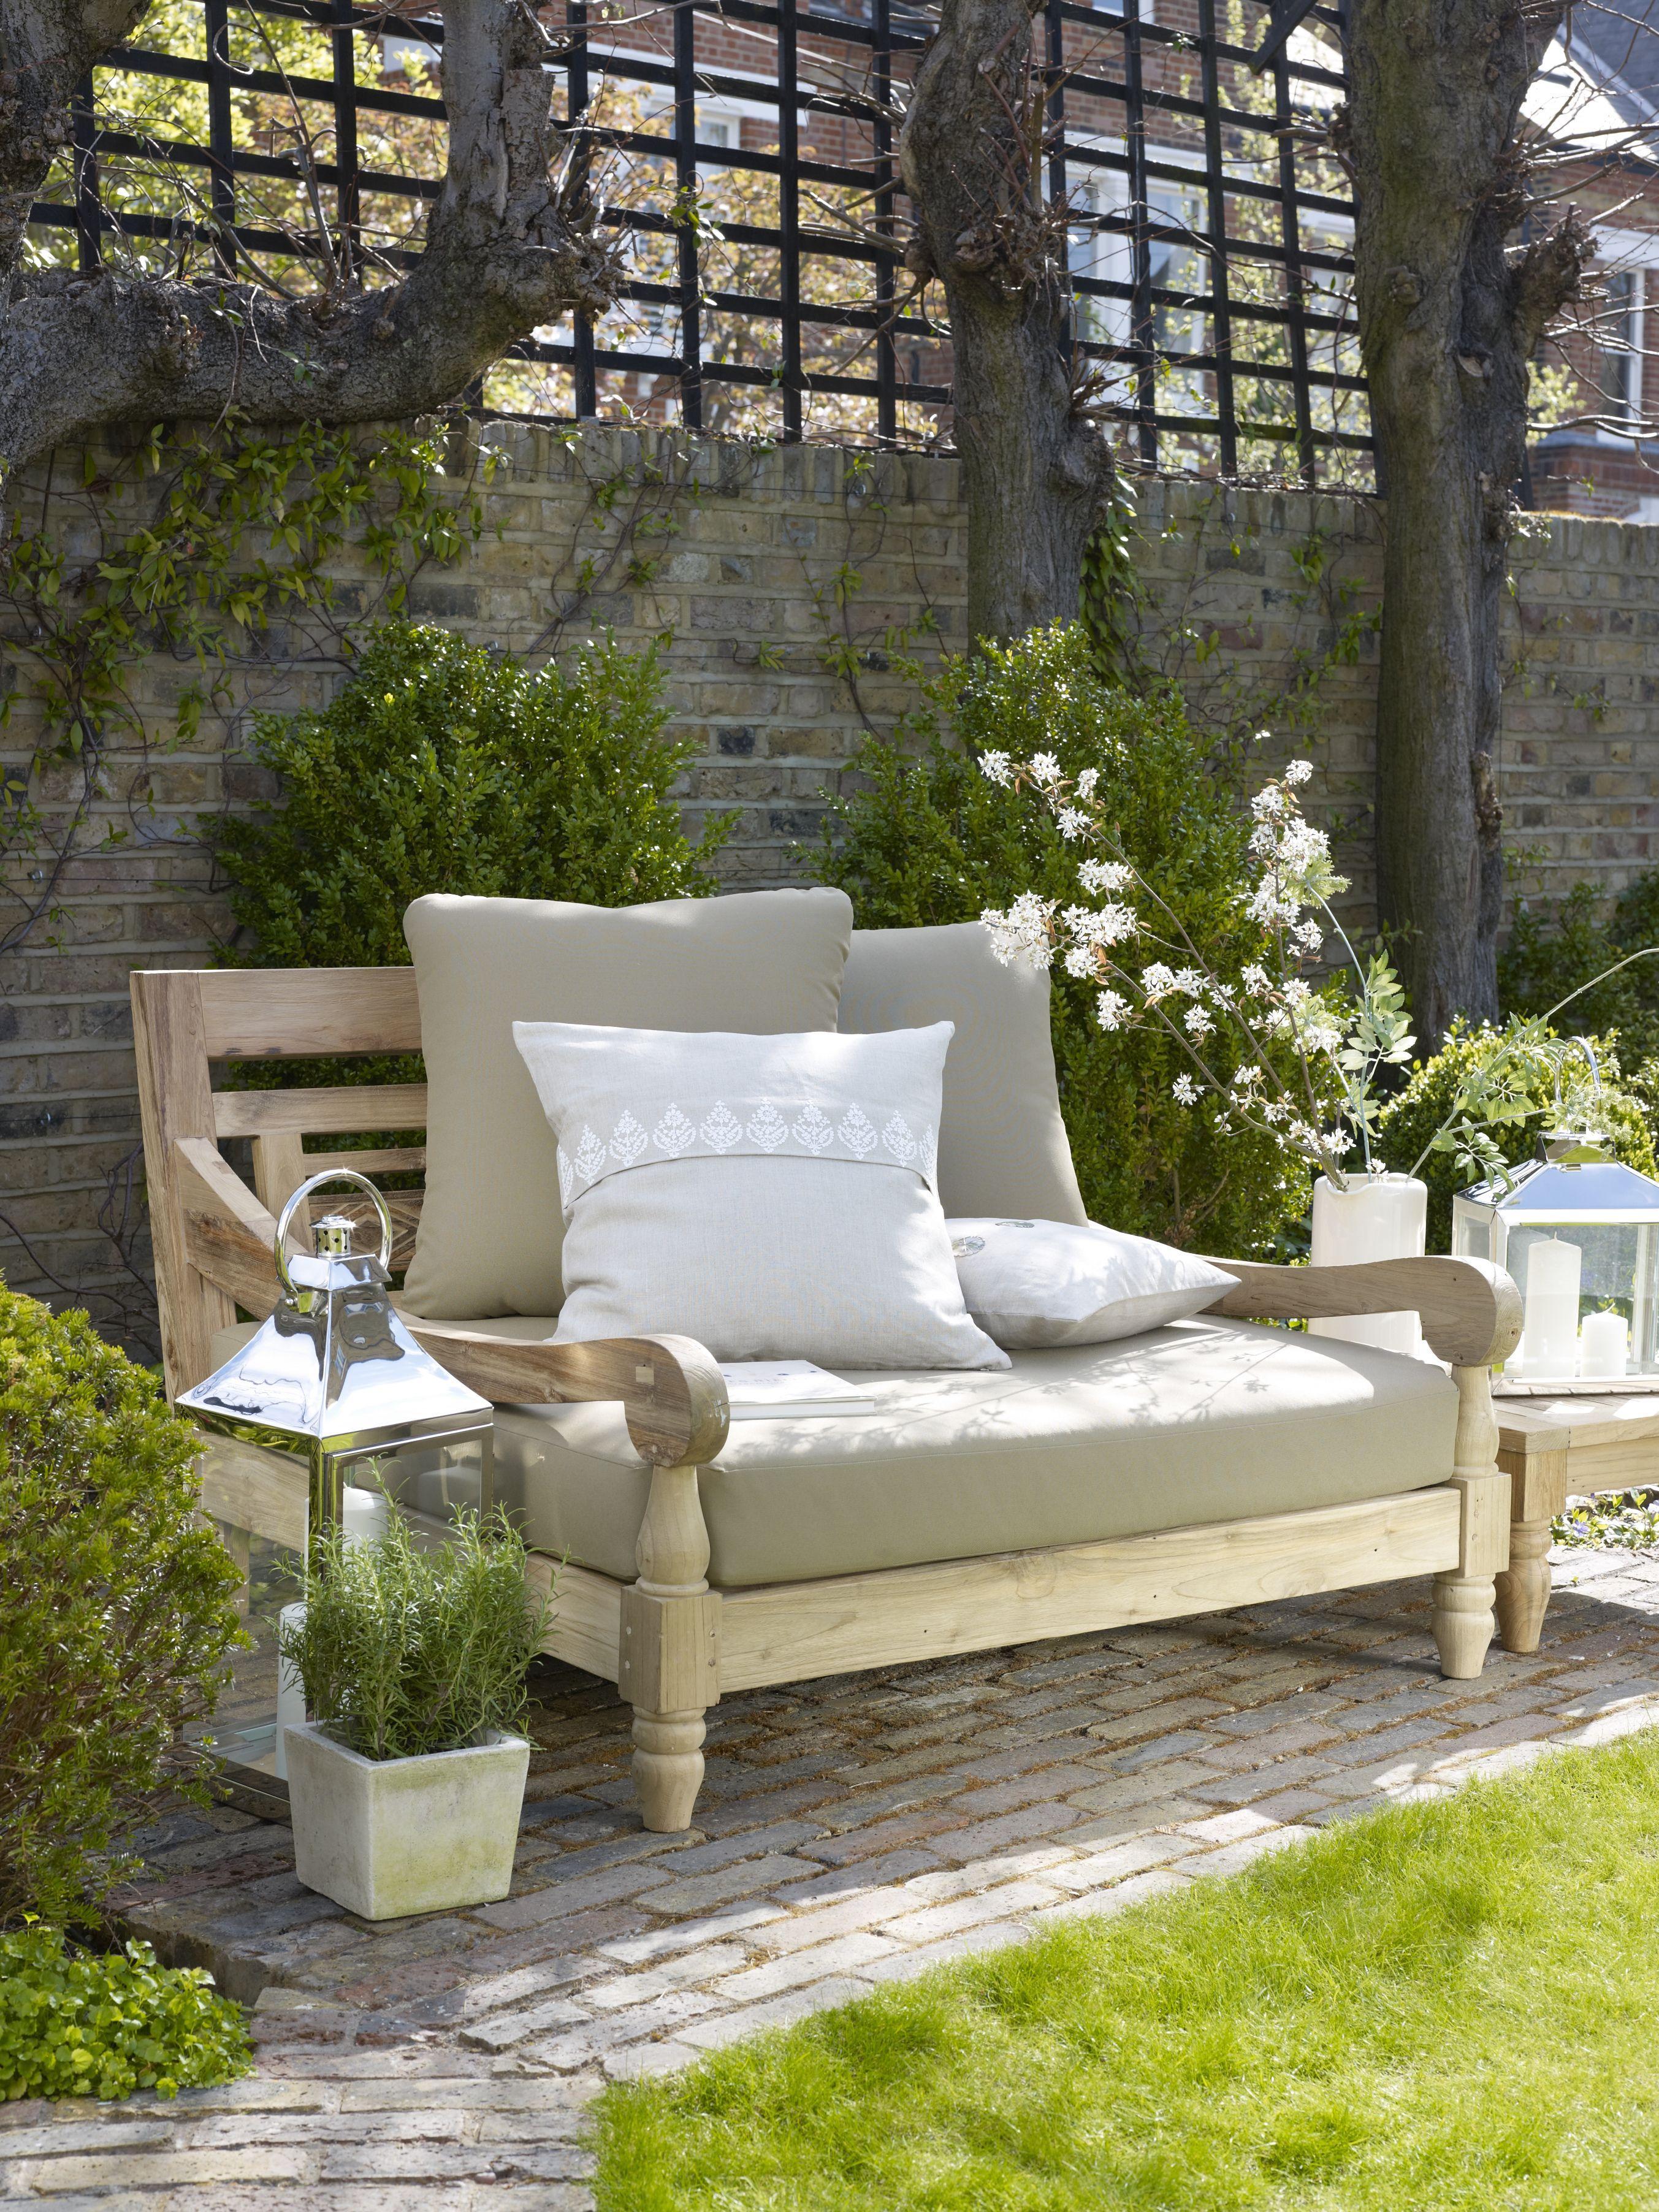 Sambala Outdoor Love Seat With Upholstery Tel 44 0 207